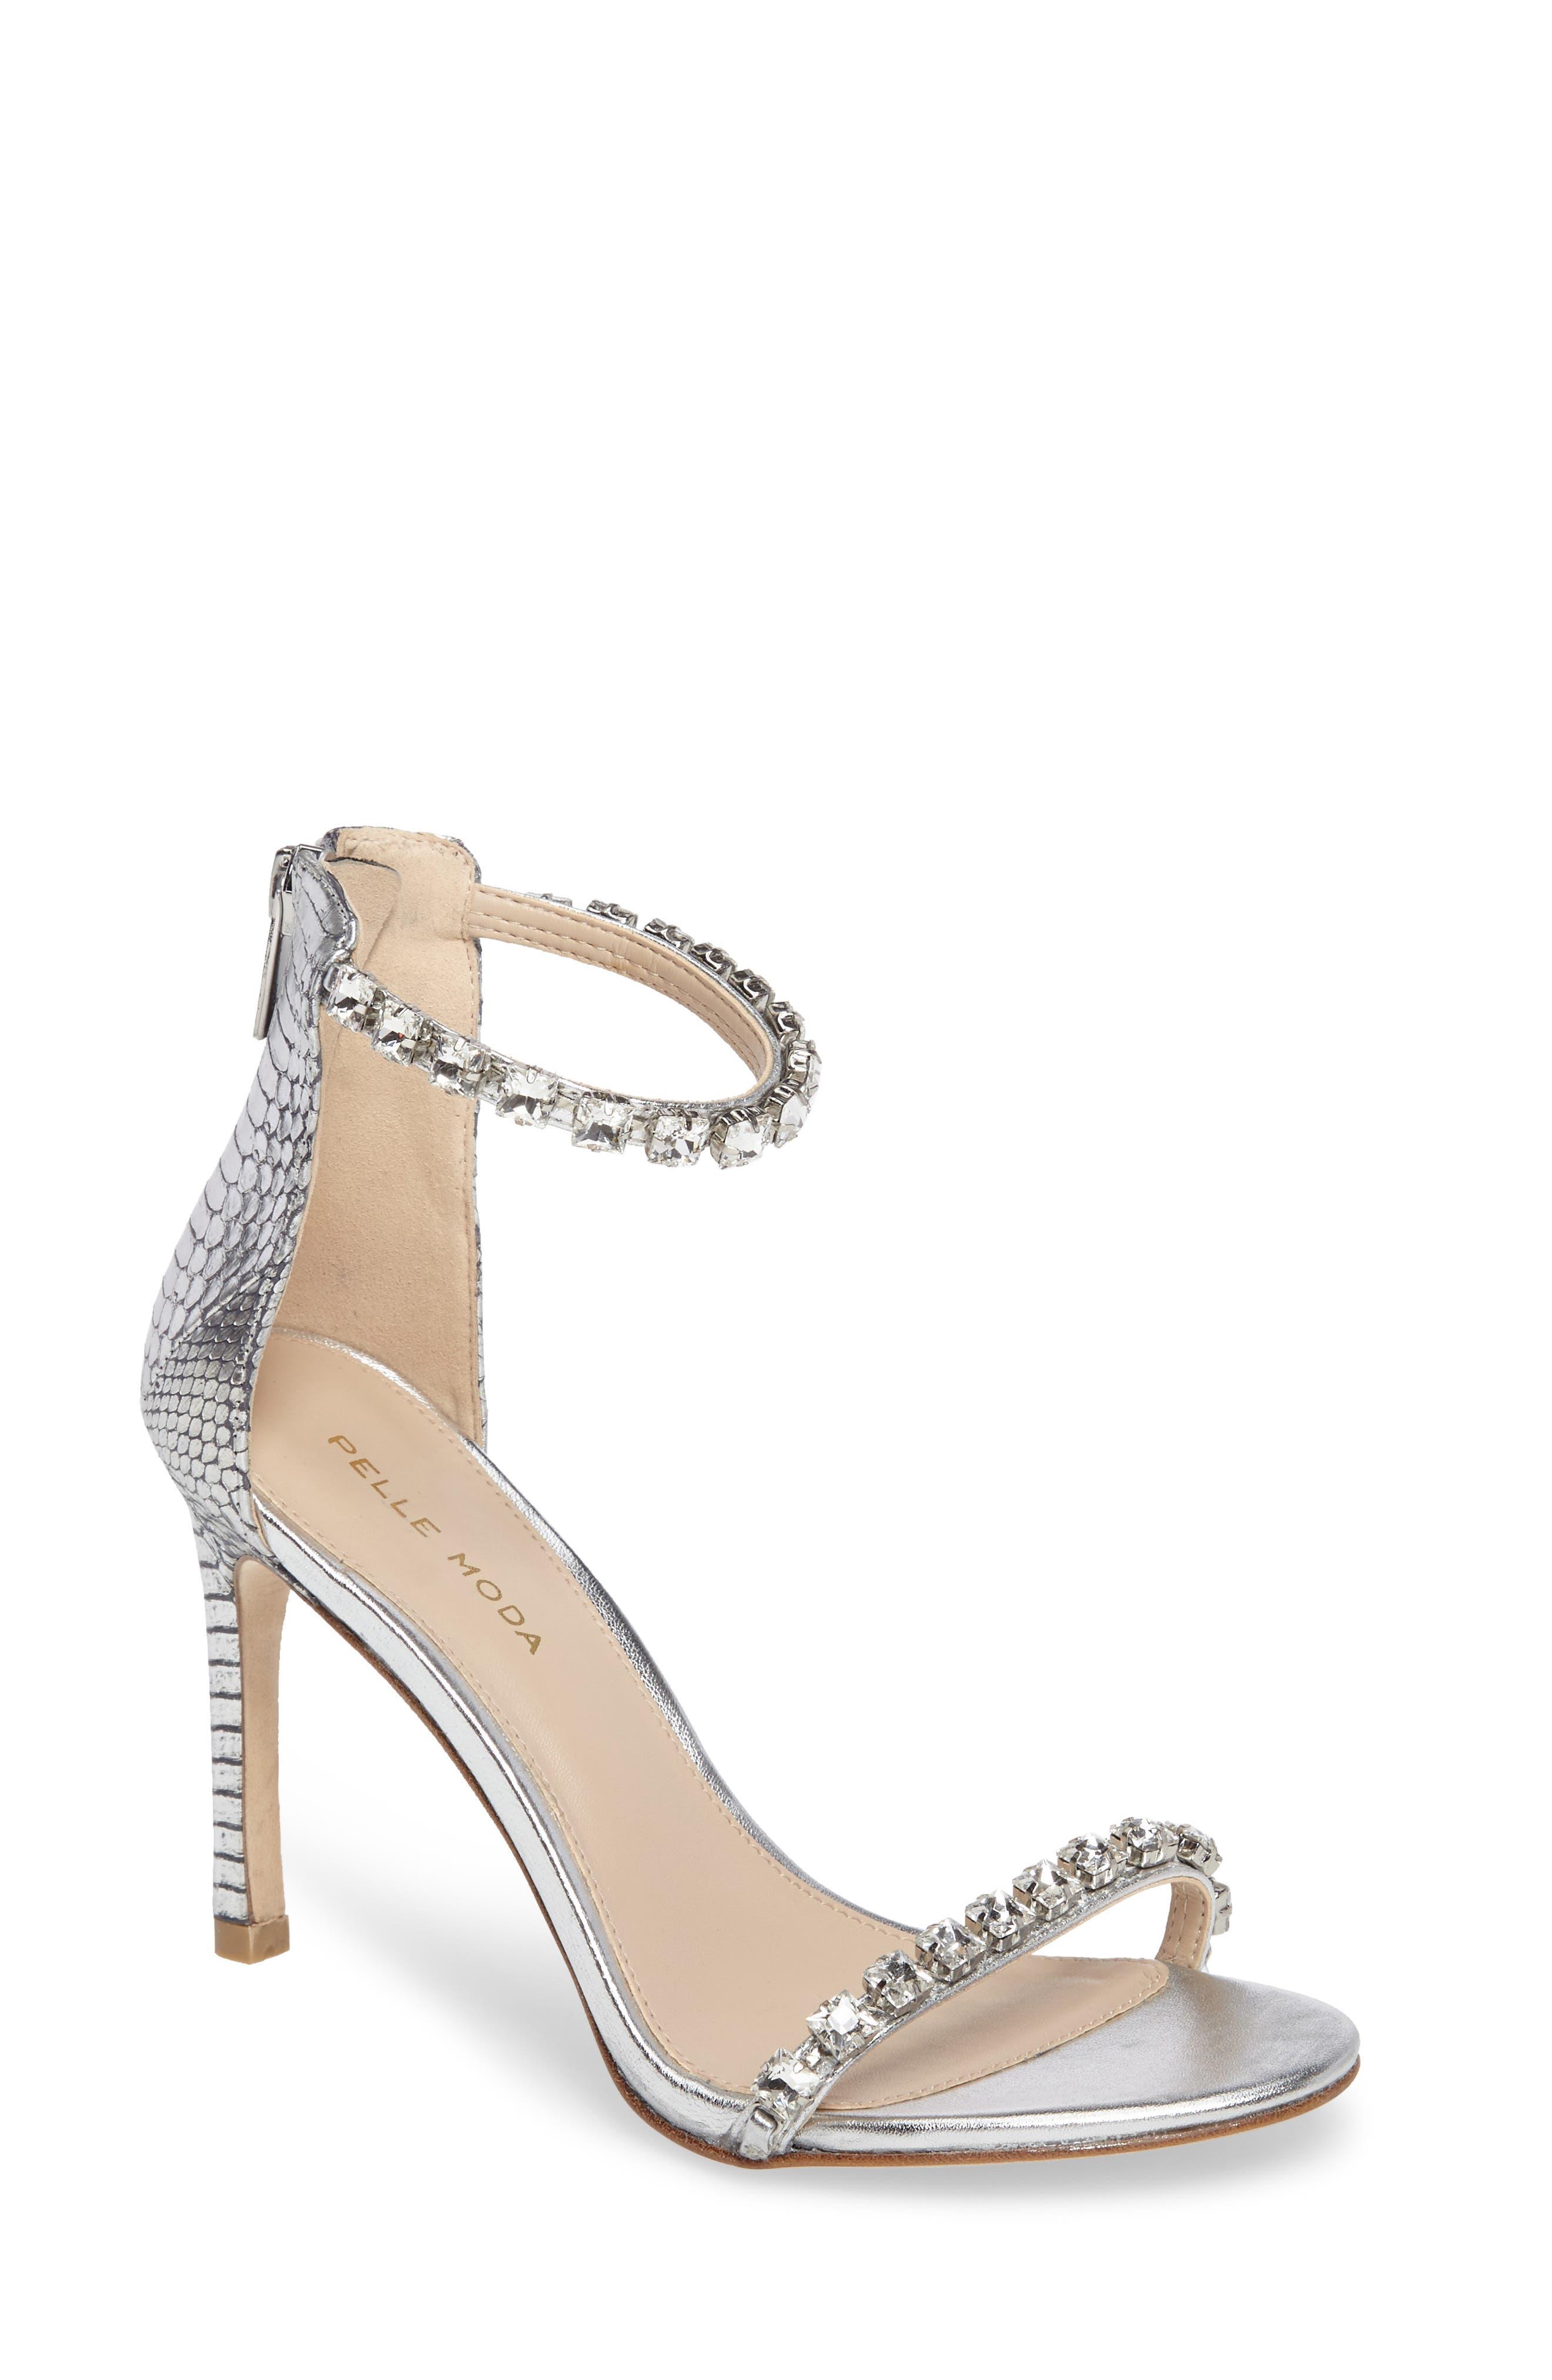 Main Image - Pelle Moda Frisk Embellished Sandal (Women)